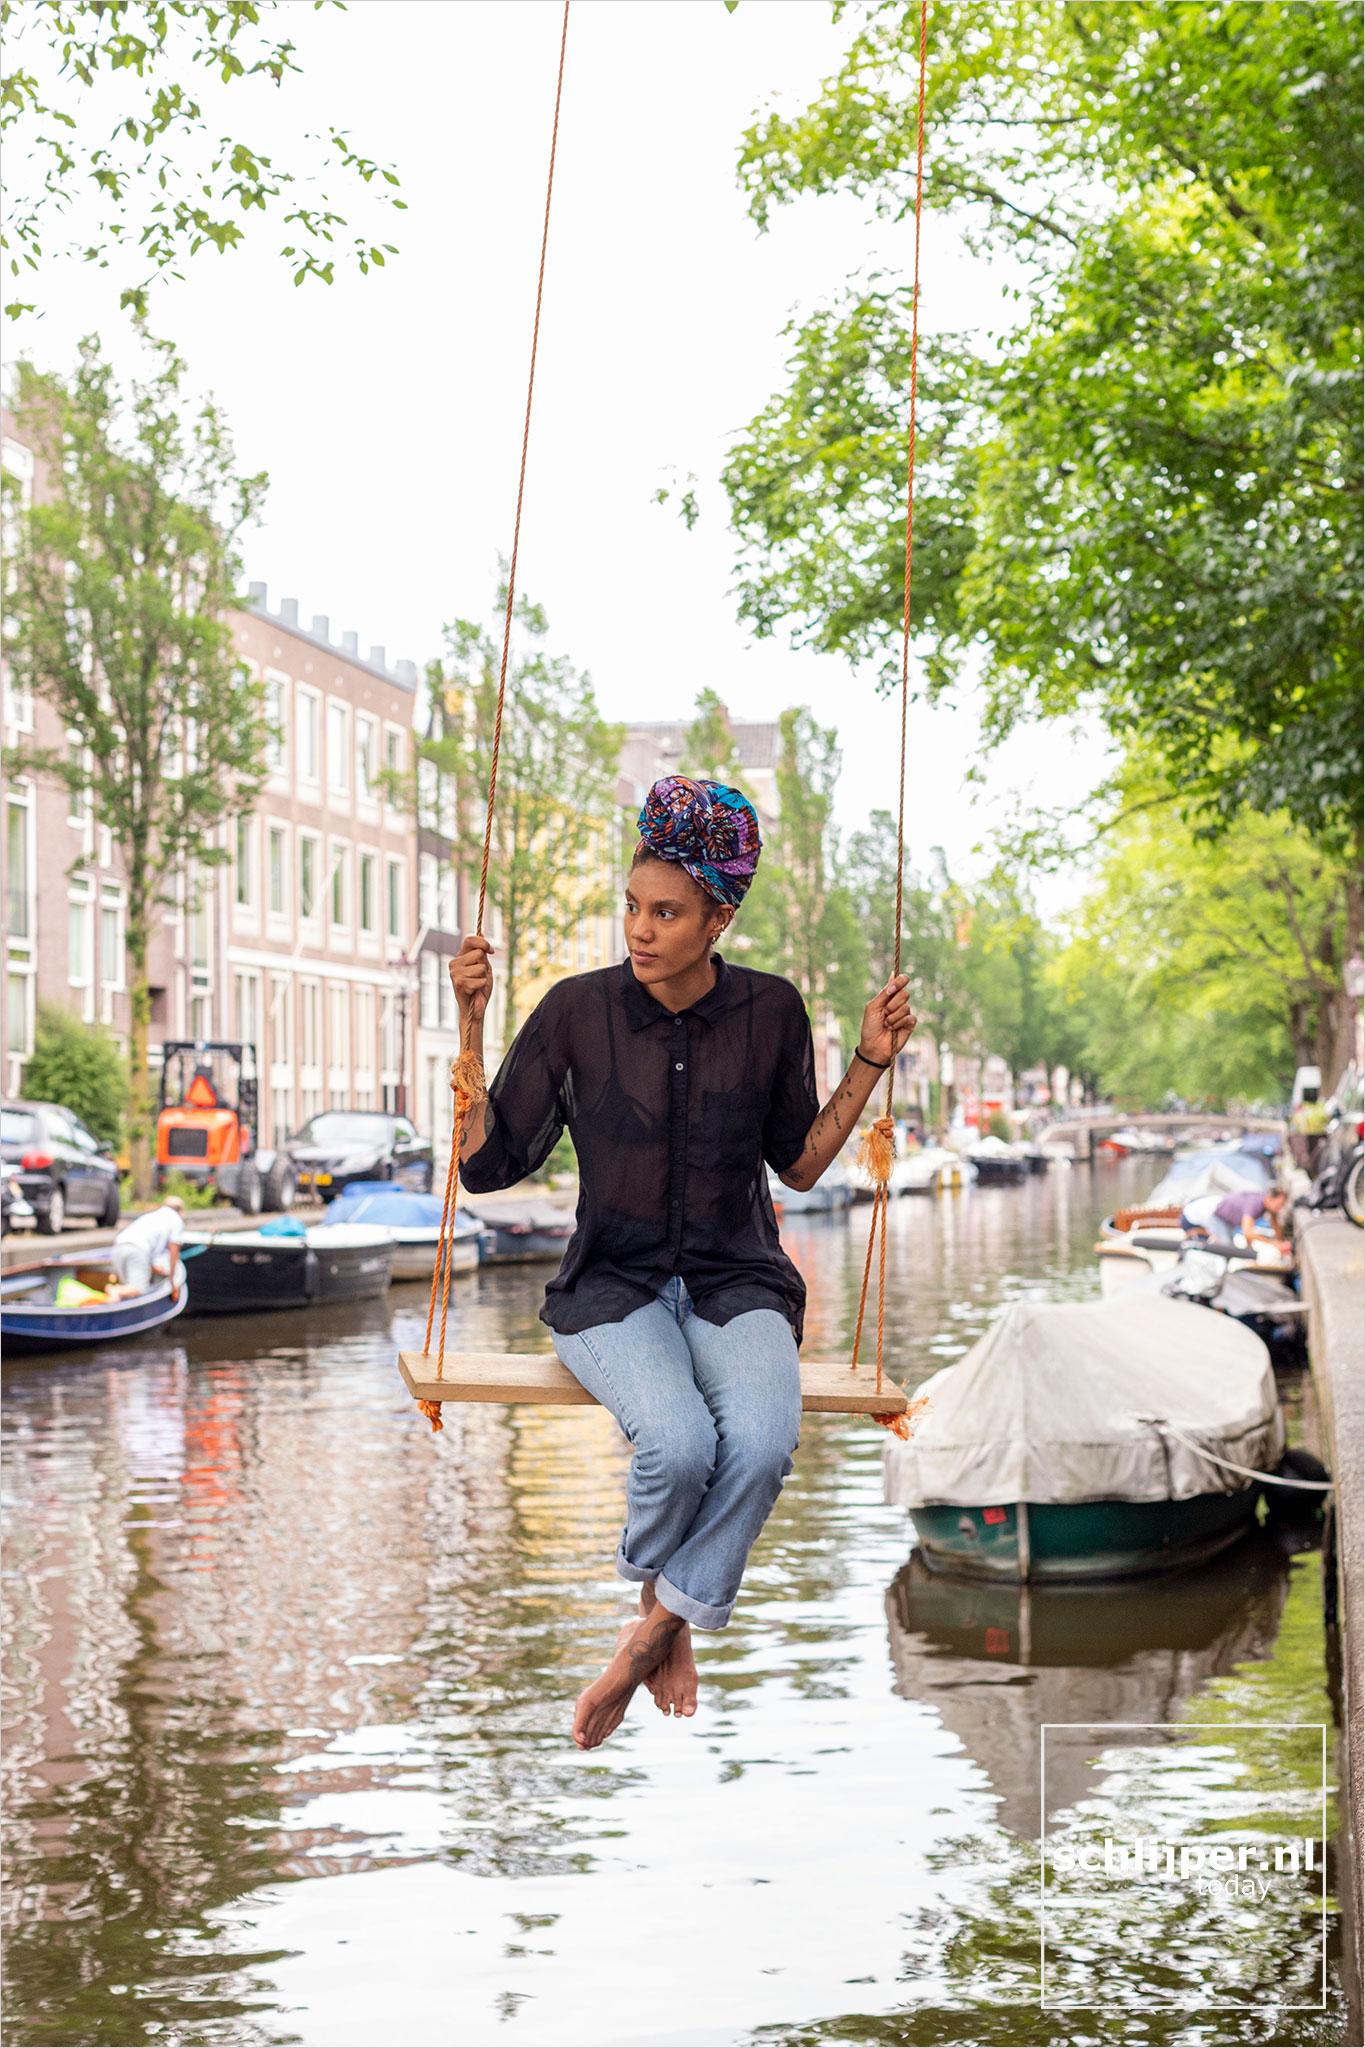 The Netherlands, Amsterdam, 3 juli 2021